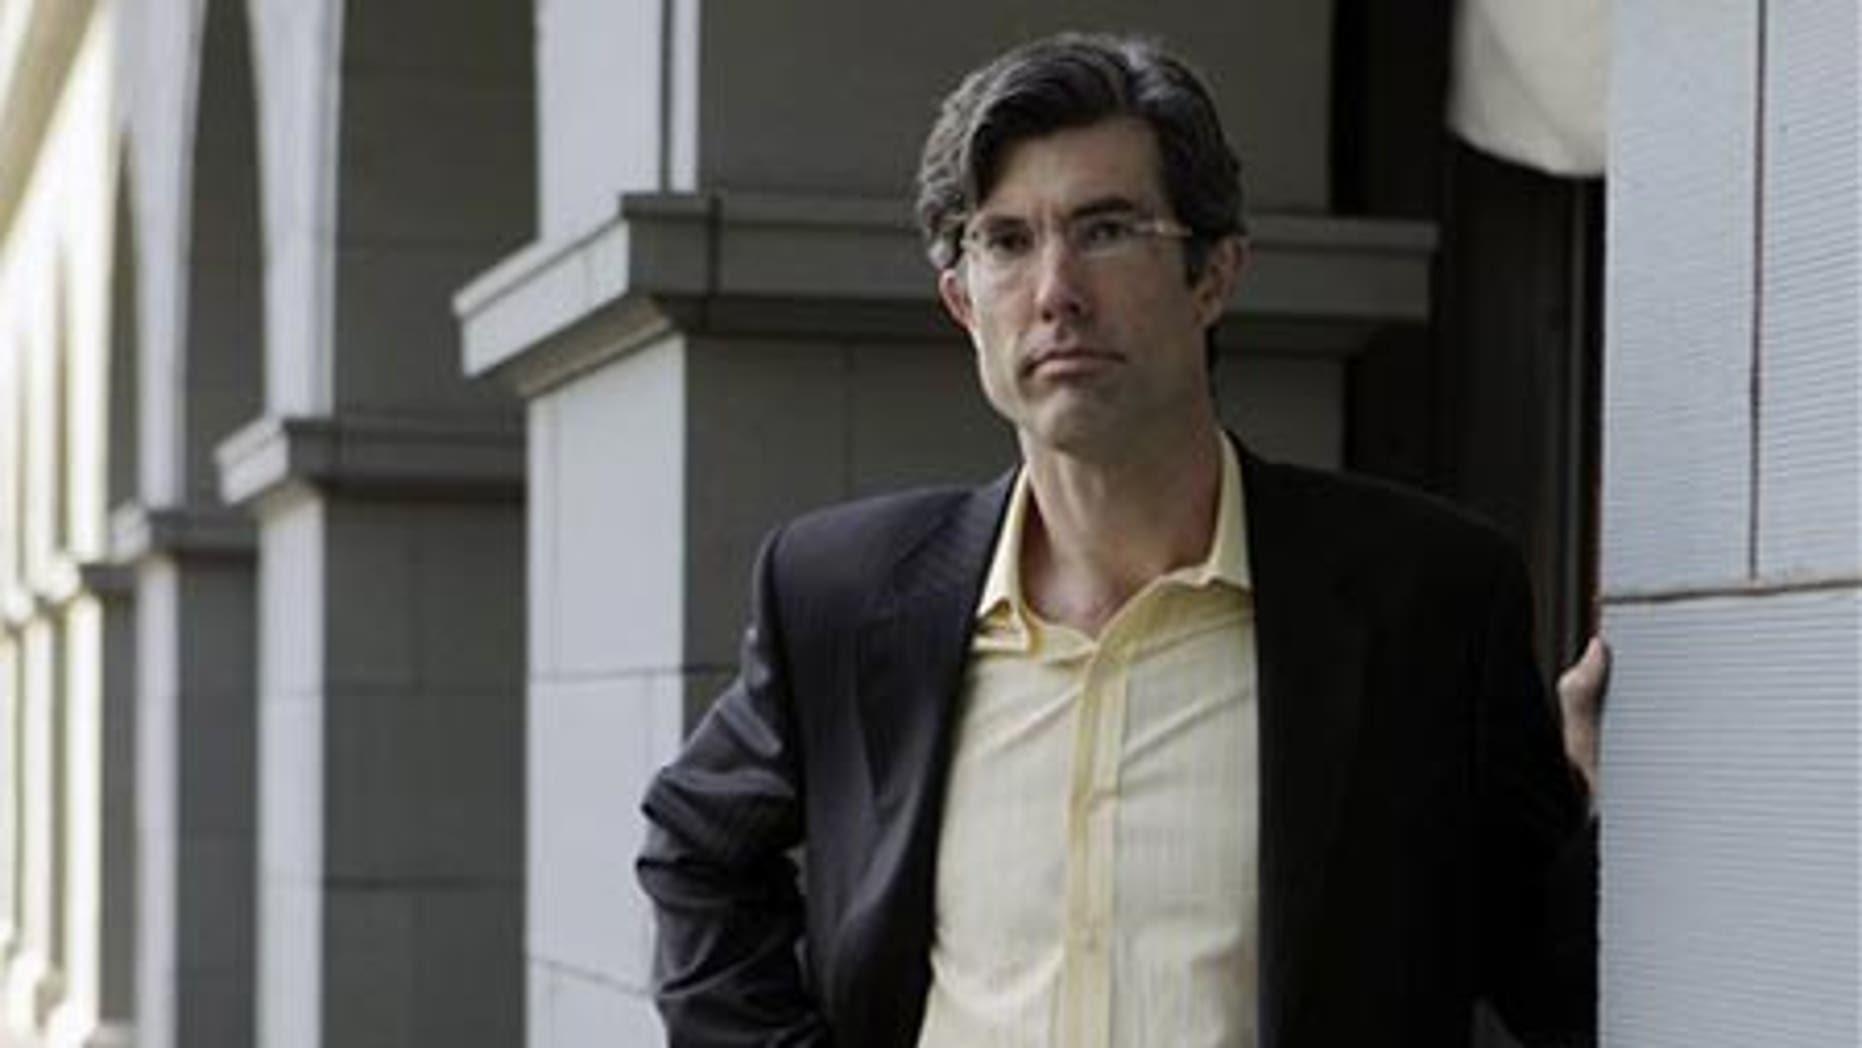 Craigslist CEO: South Carolina Prosecutor Unfairly Targeting